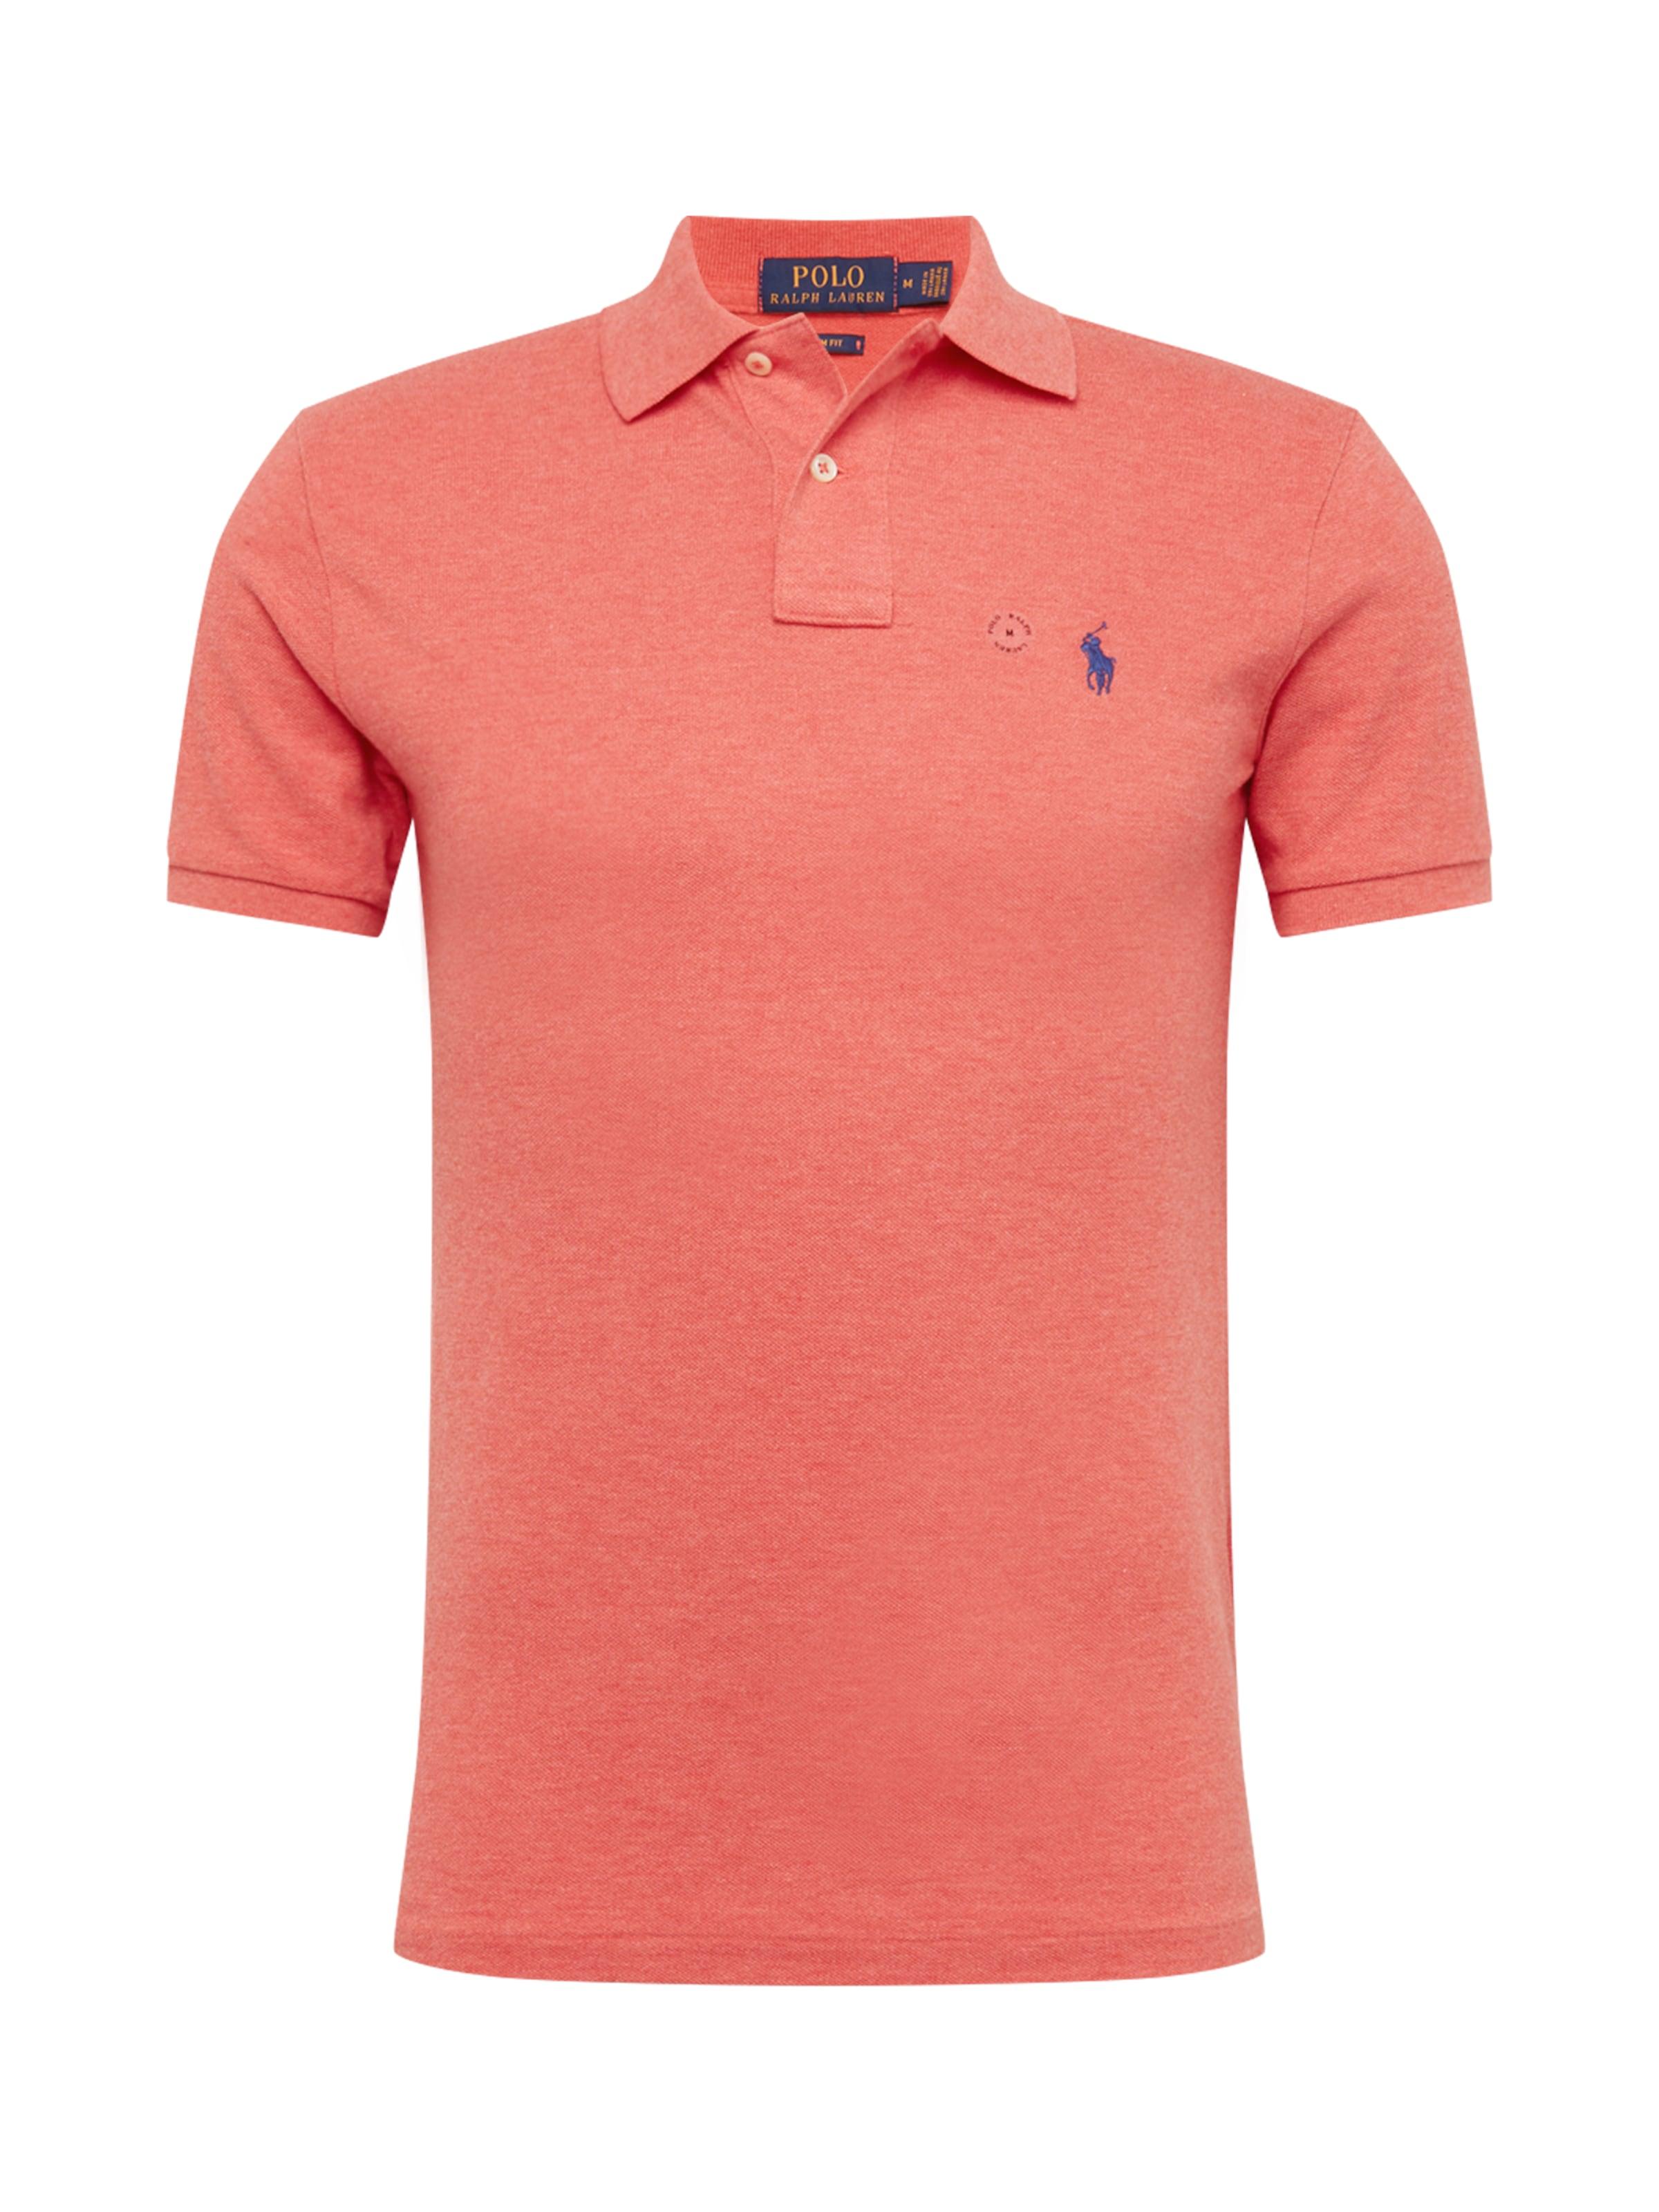 T short Polo Ralph Lauren Sleeve shirt knit' 'sskcslm1 Rosé En fgIb7Y6vy